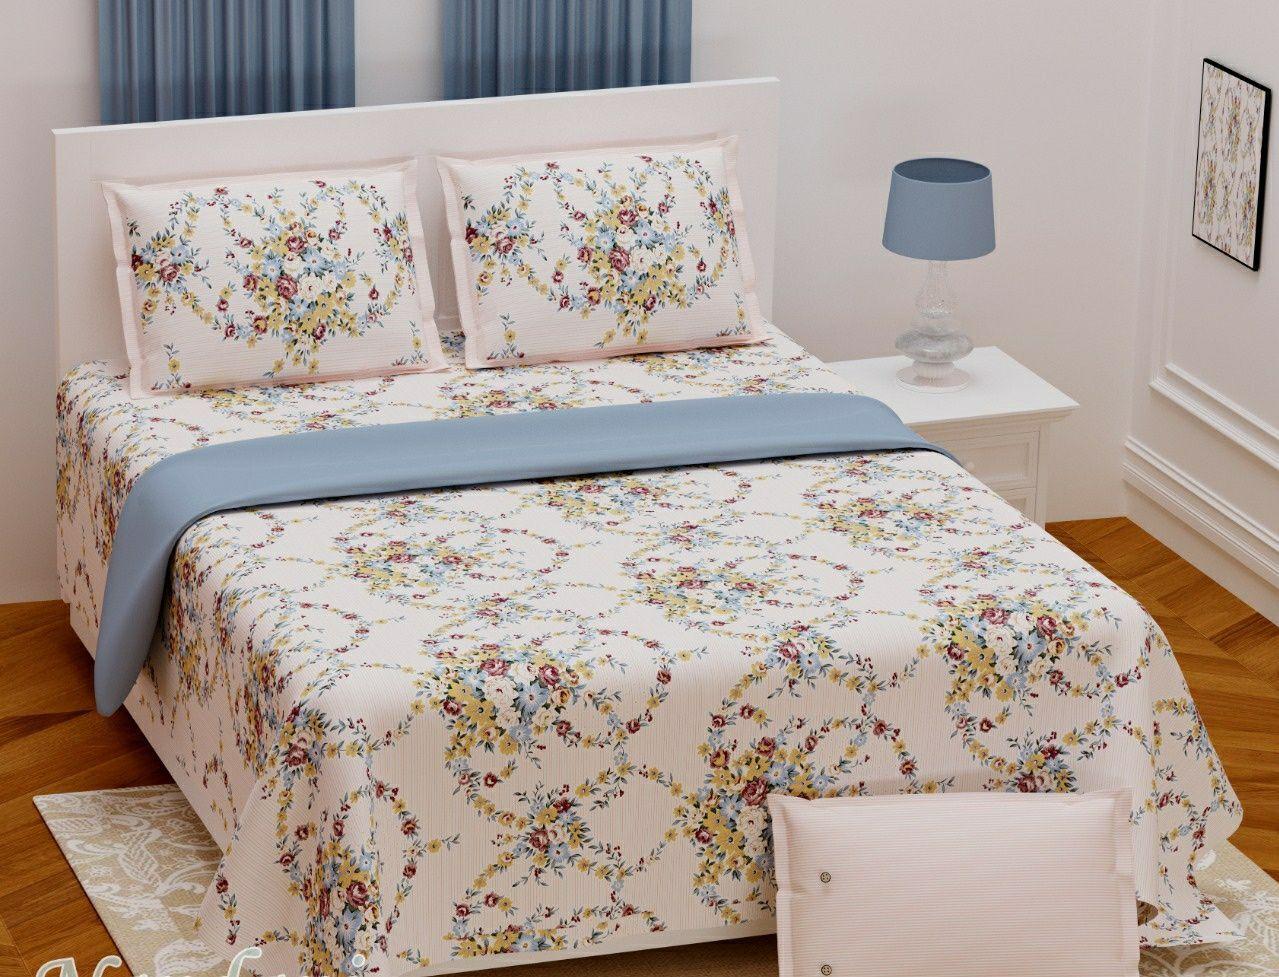 Bedsheet cotton double bed king size 108×108 Nandini milki